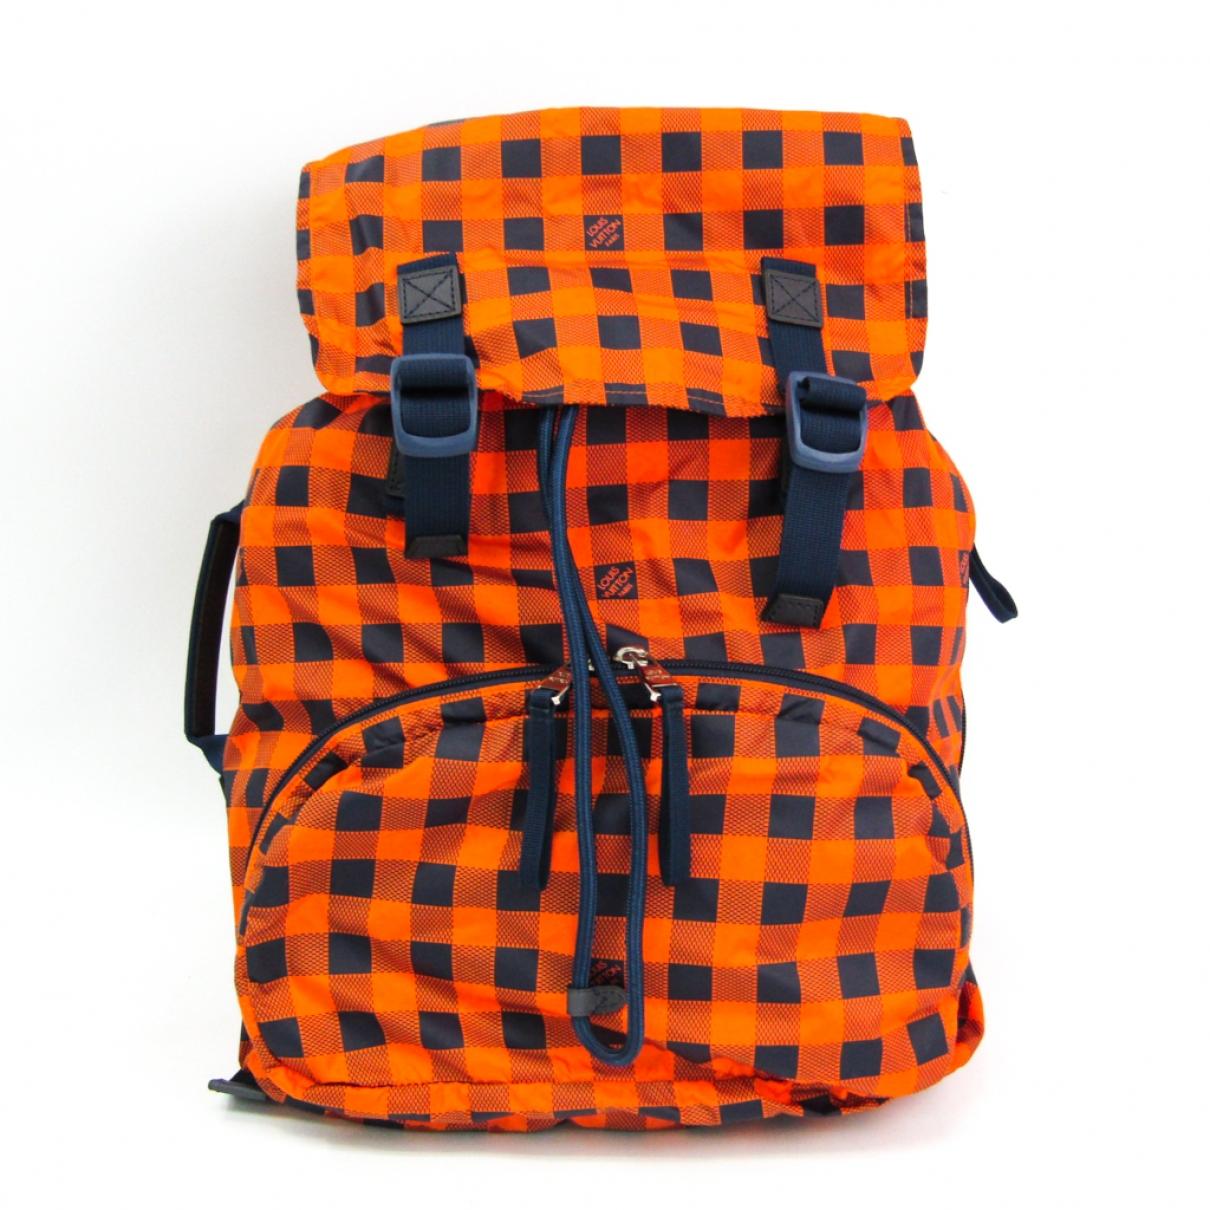 Louis Vuitton \N Orange Cloth bag for Men \N